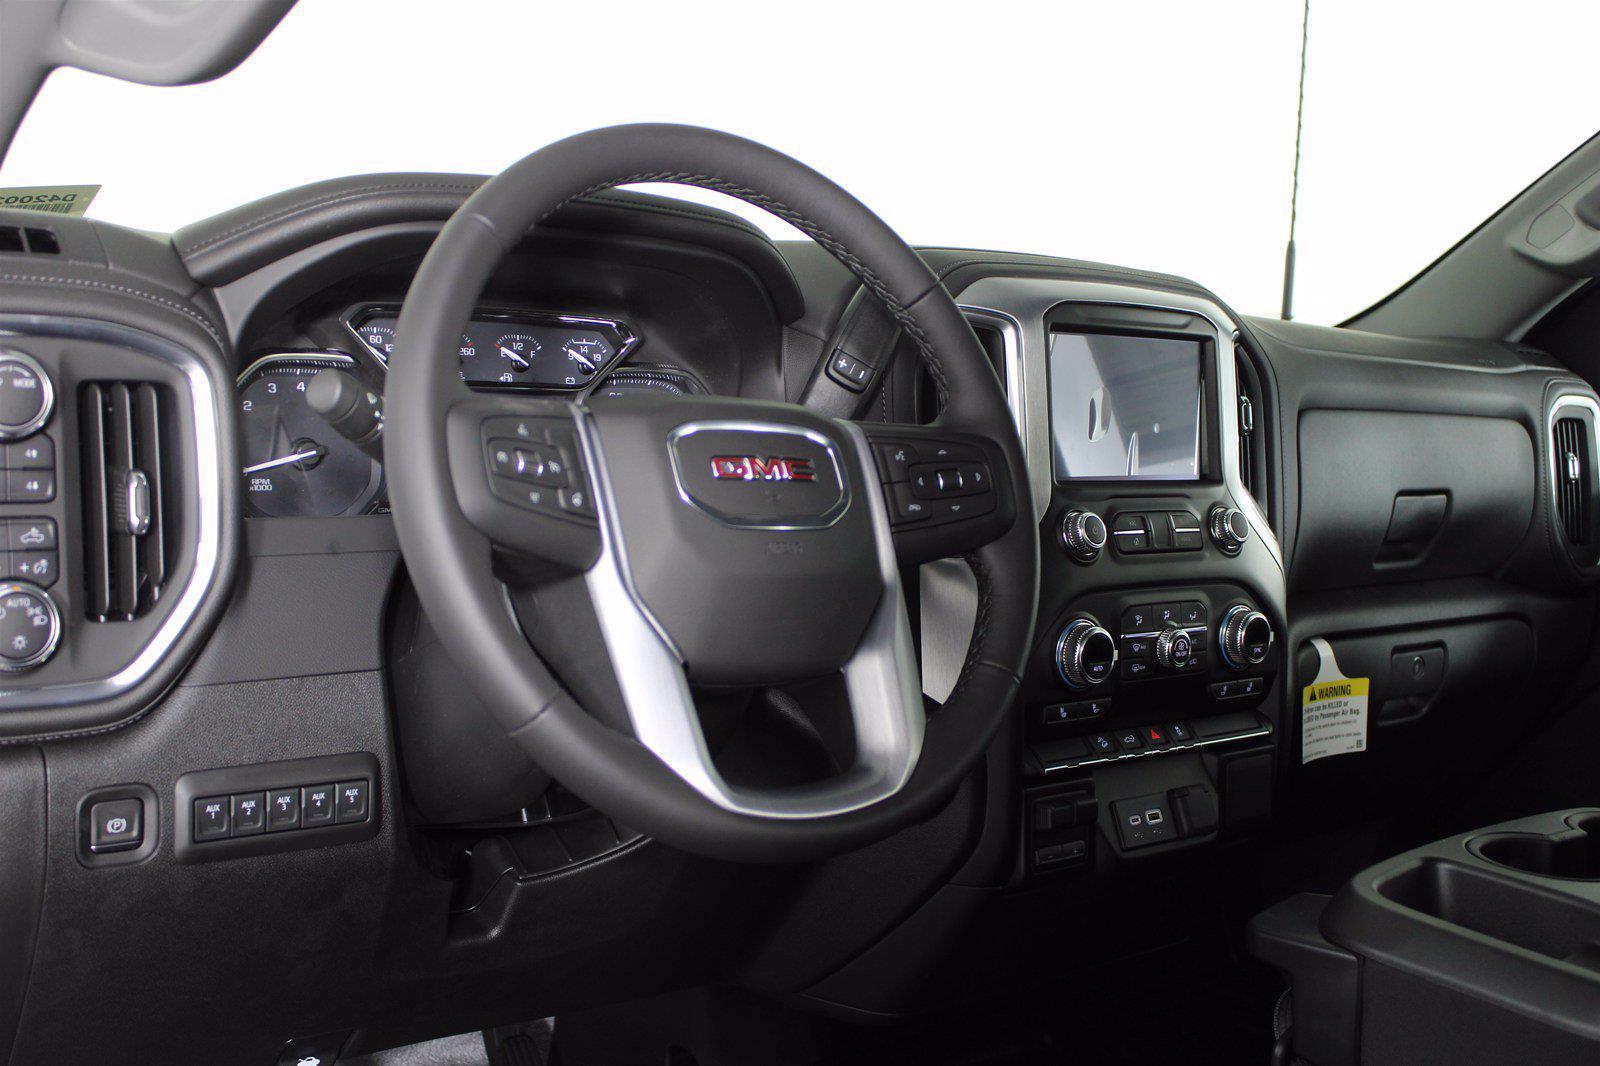 2022 Sierra 2500 Regular Cab 4x4,  Pickup #D420023 - photo 10